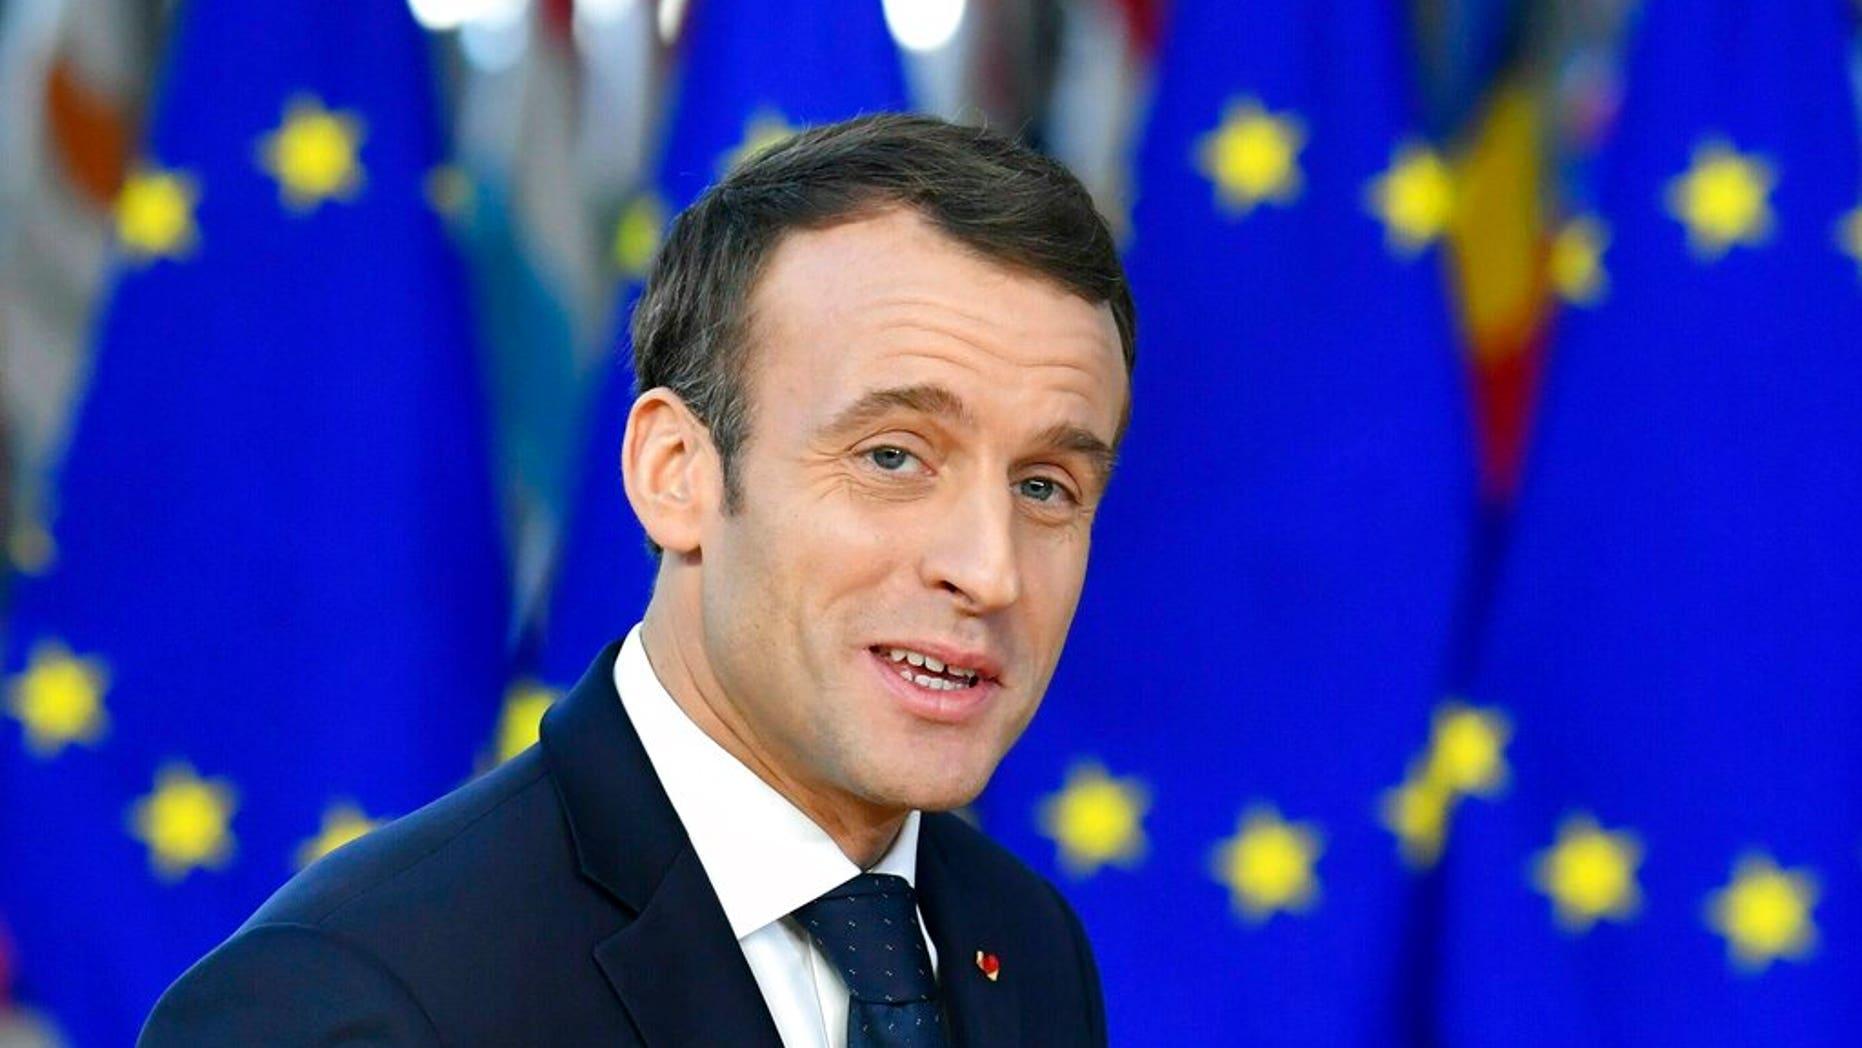 Brexiteers lied to United Kingdom, says Emmanuel Macron